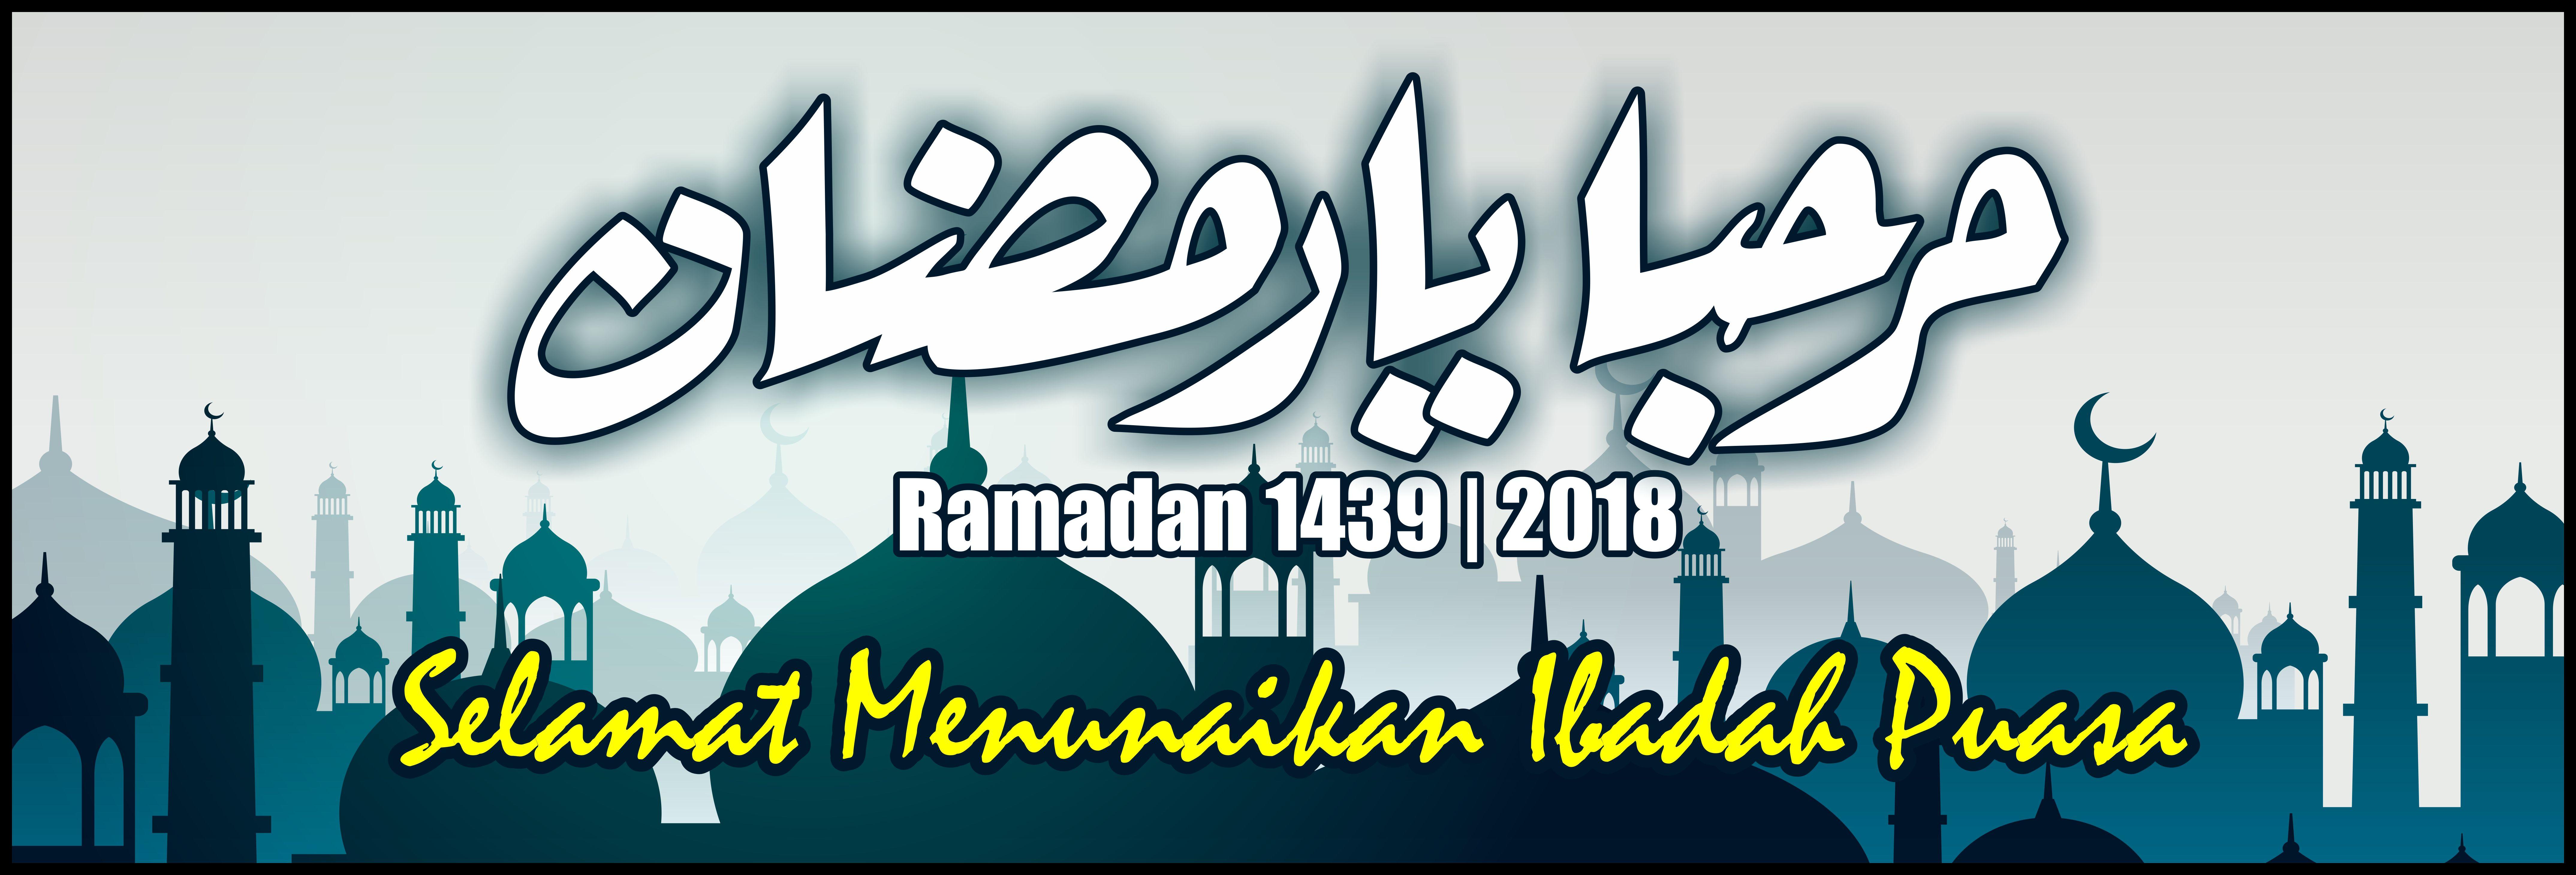 Banner Spanduk Ramadan 1439h 2018 Free Download Vector PDF Jpg HD